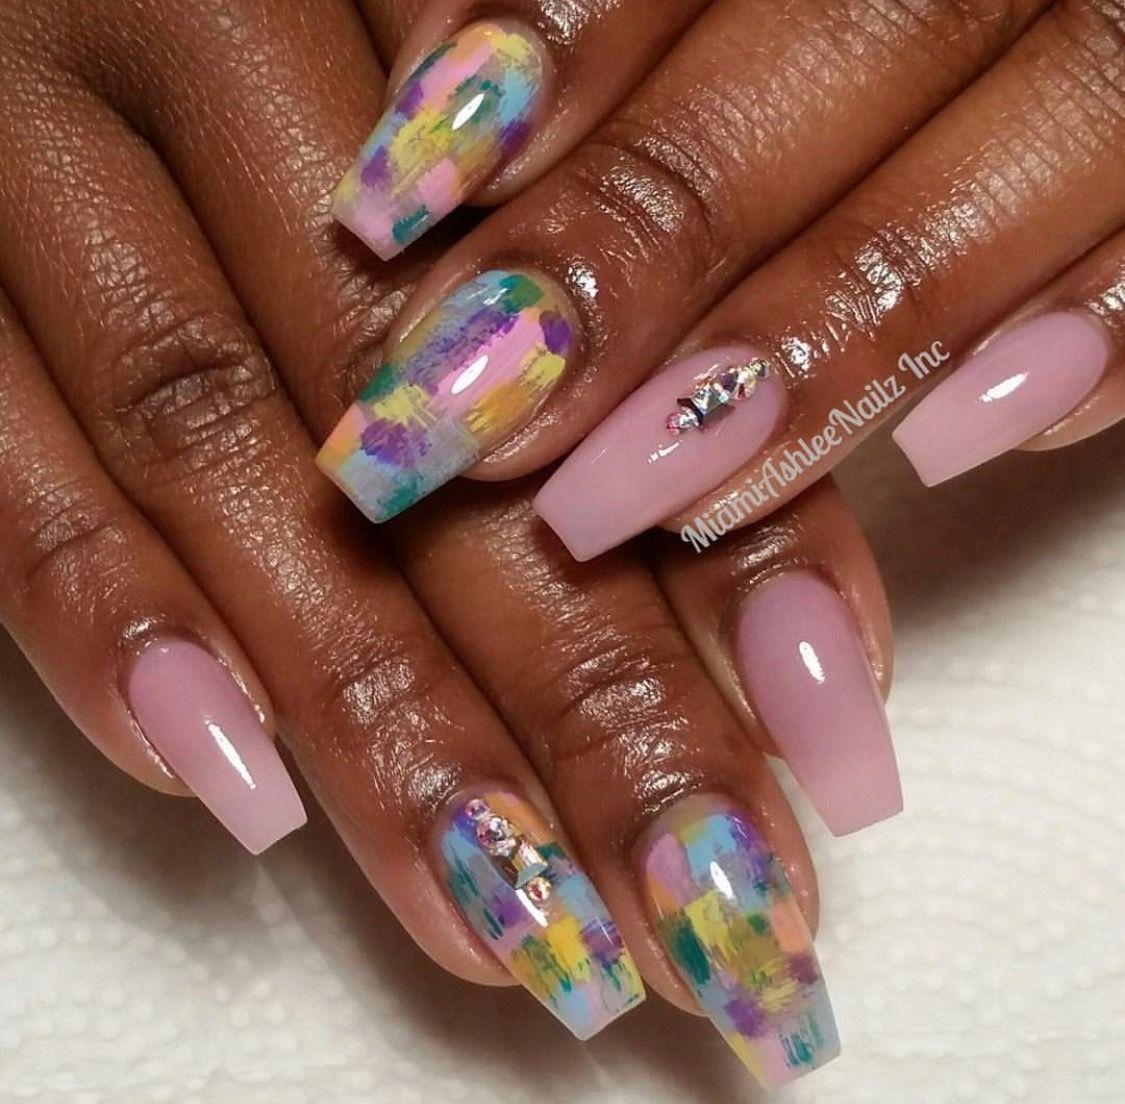 Pin by erika stevens on nail ideas pinterest acrylic nail designs